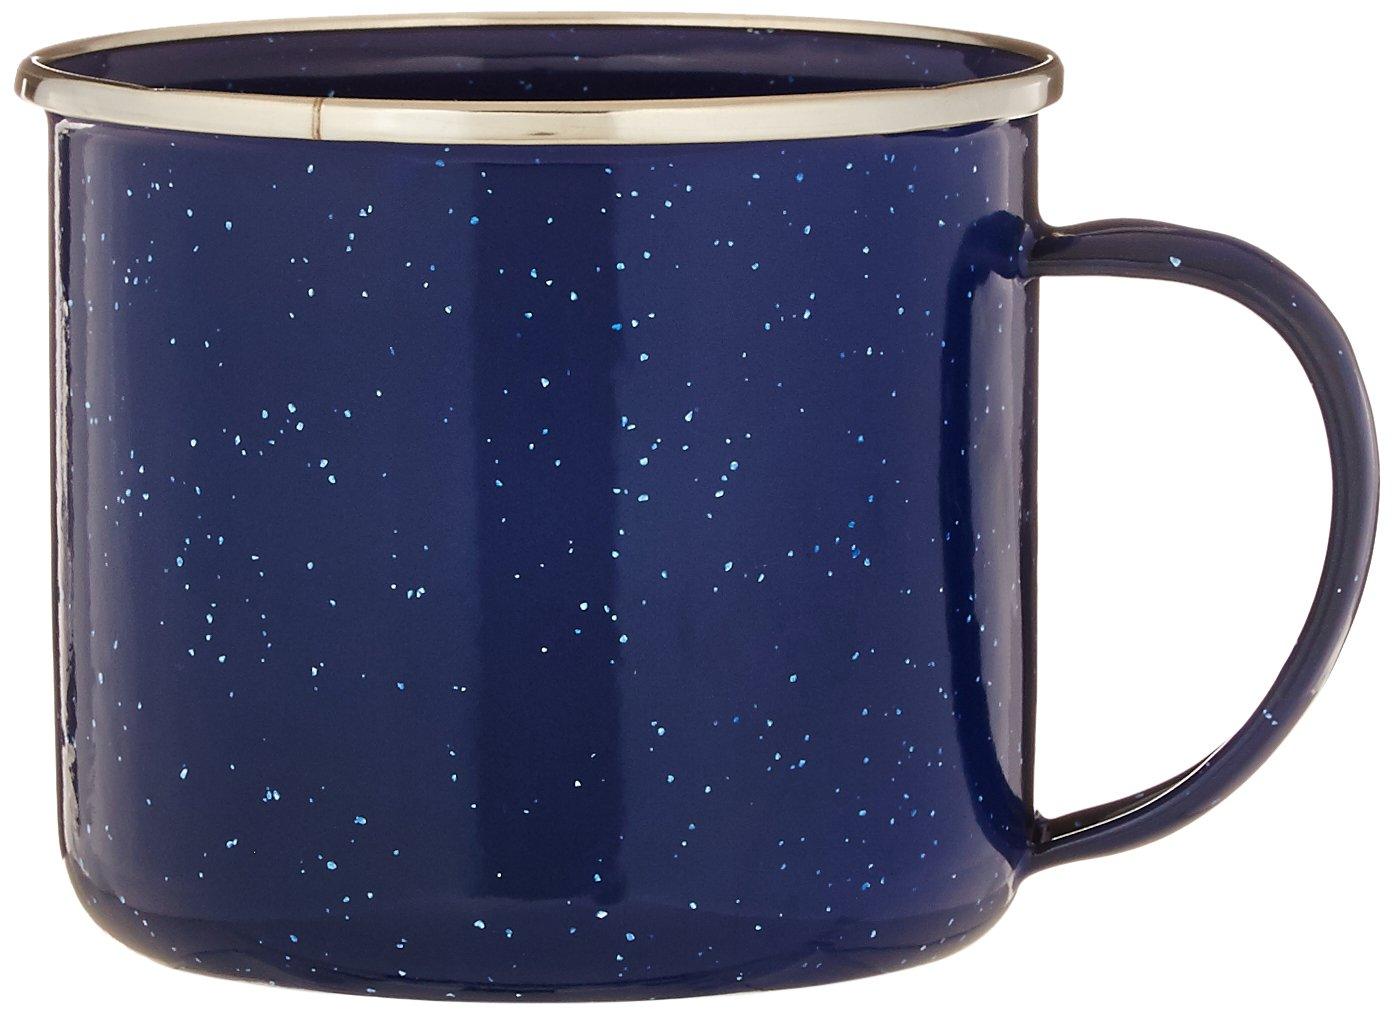 Ss Edge Enamel Coffee Stansport Mug zUMpqVLSG